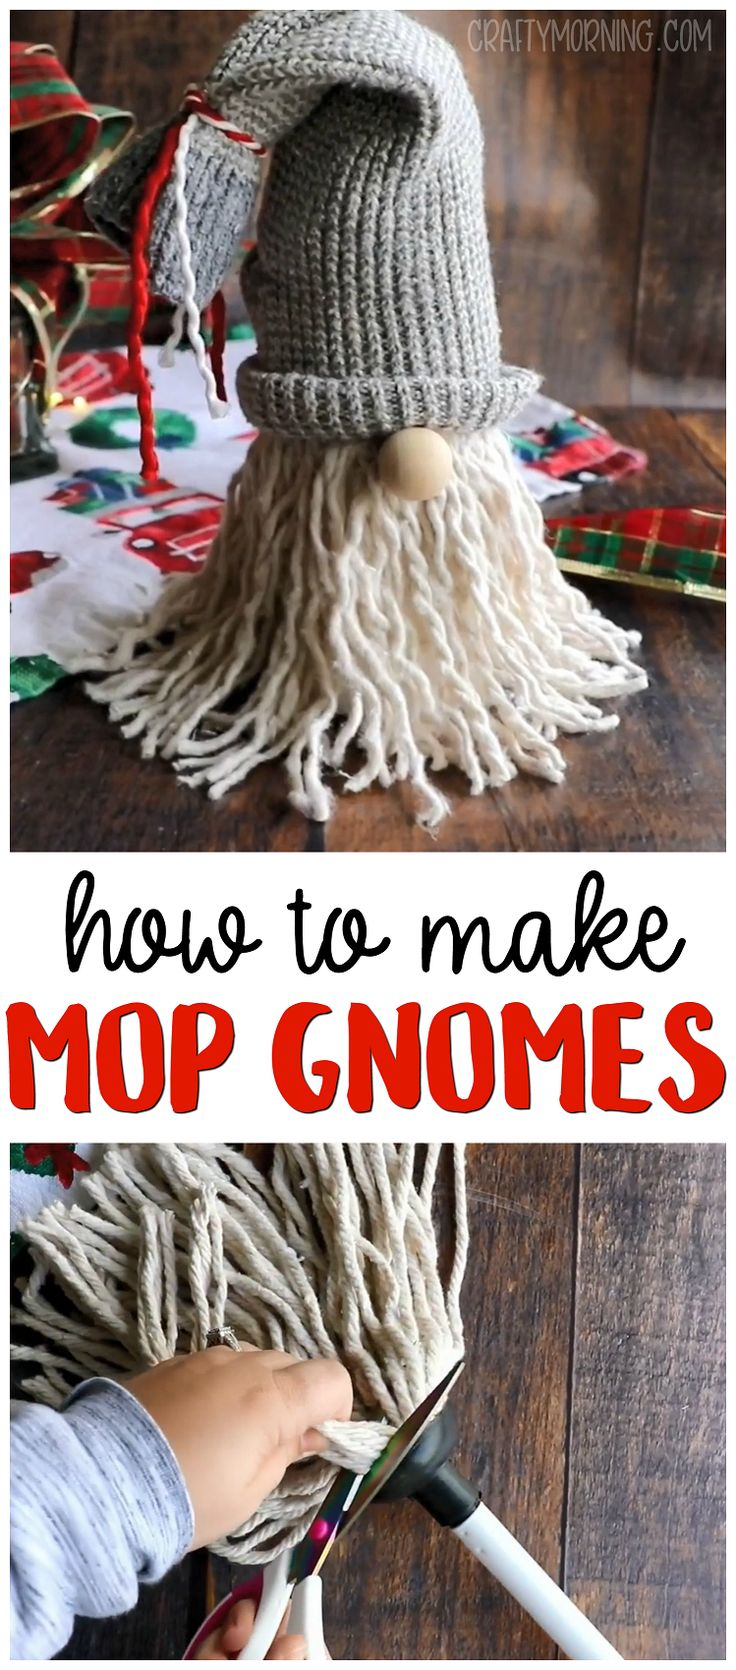 DIY Mop Gnomes